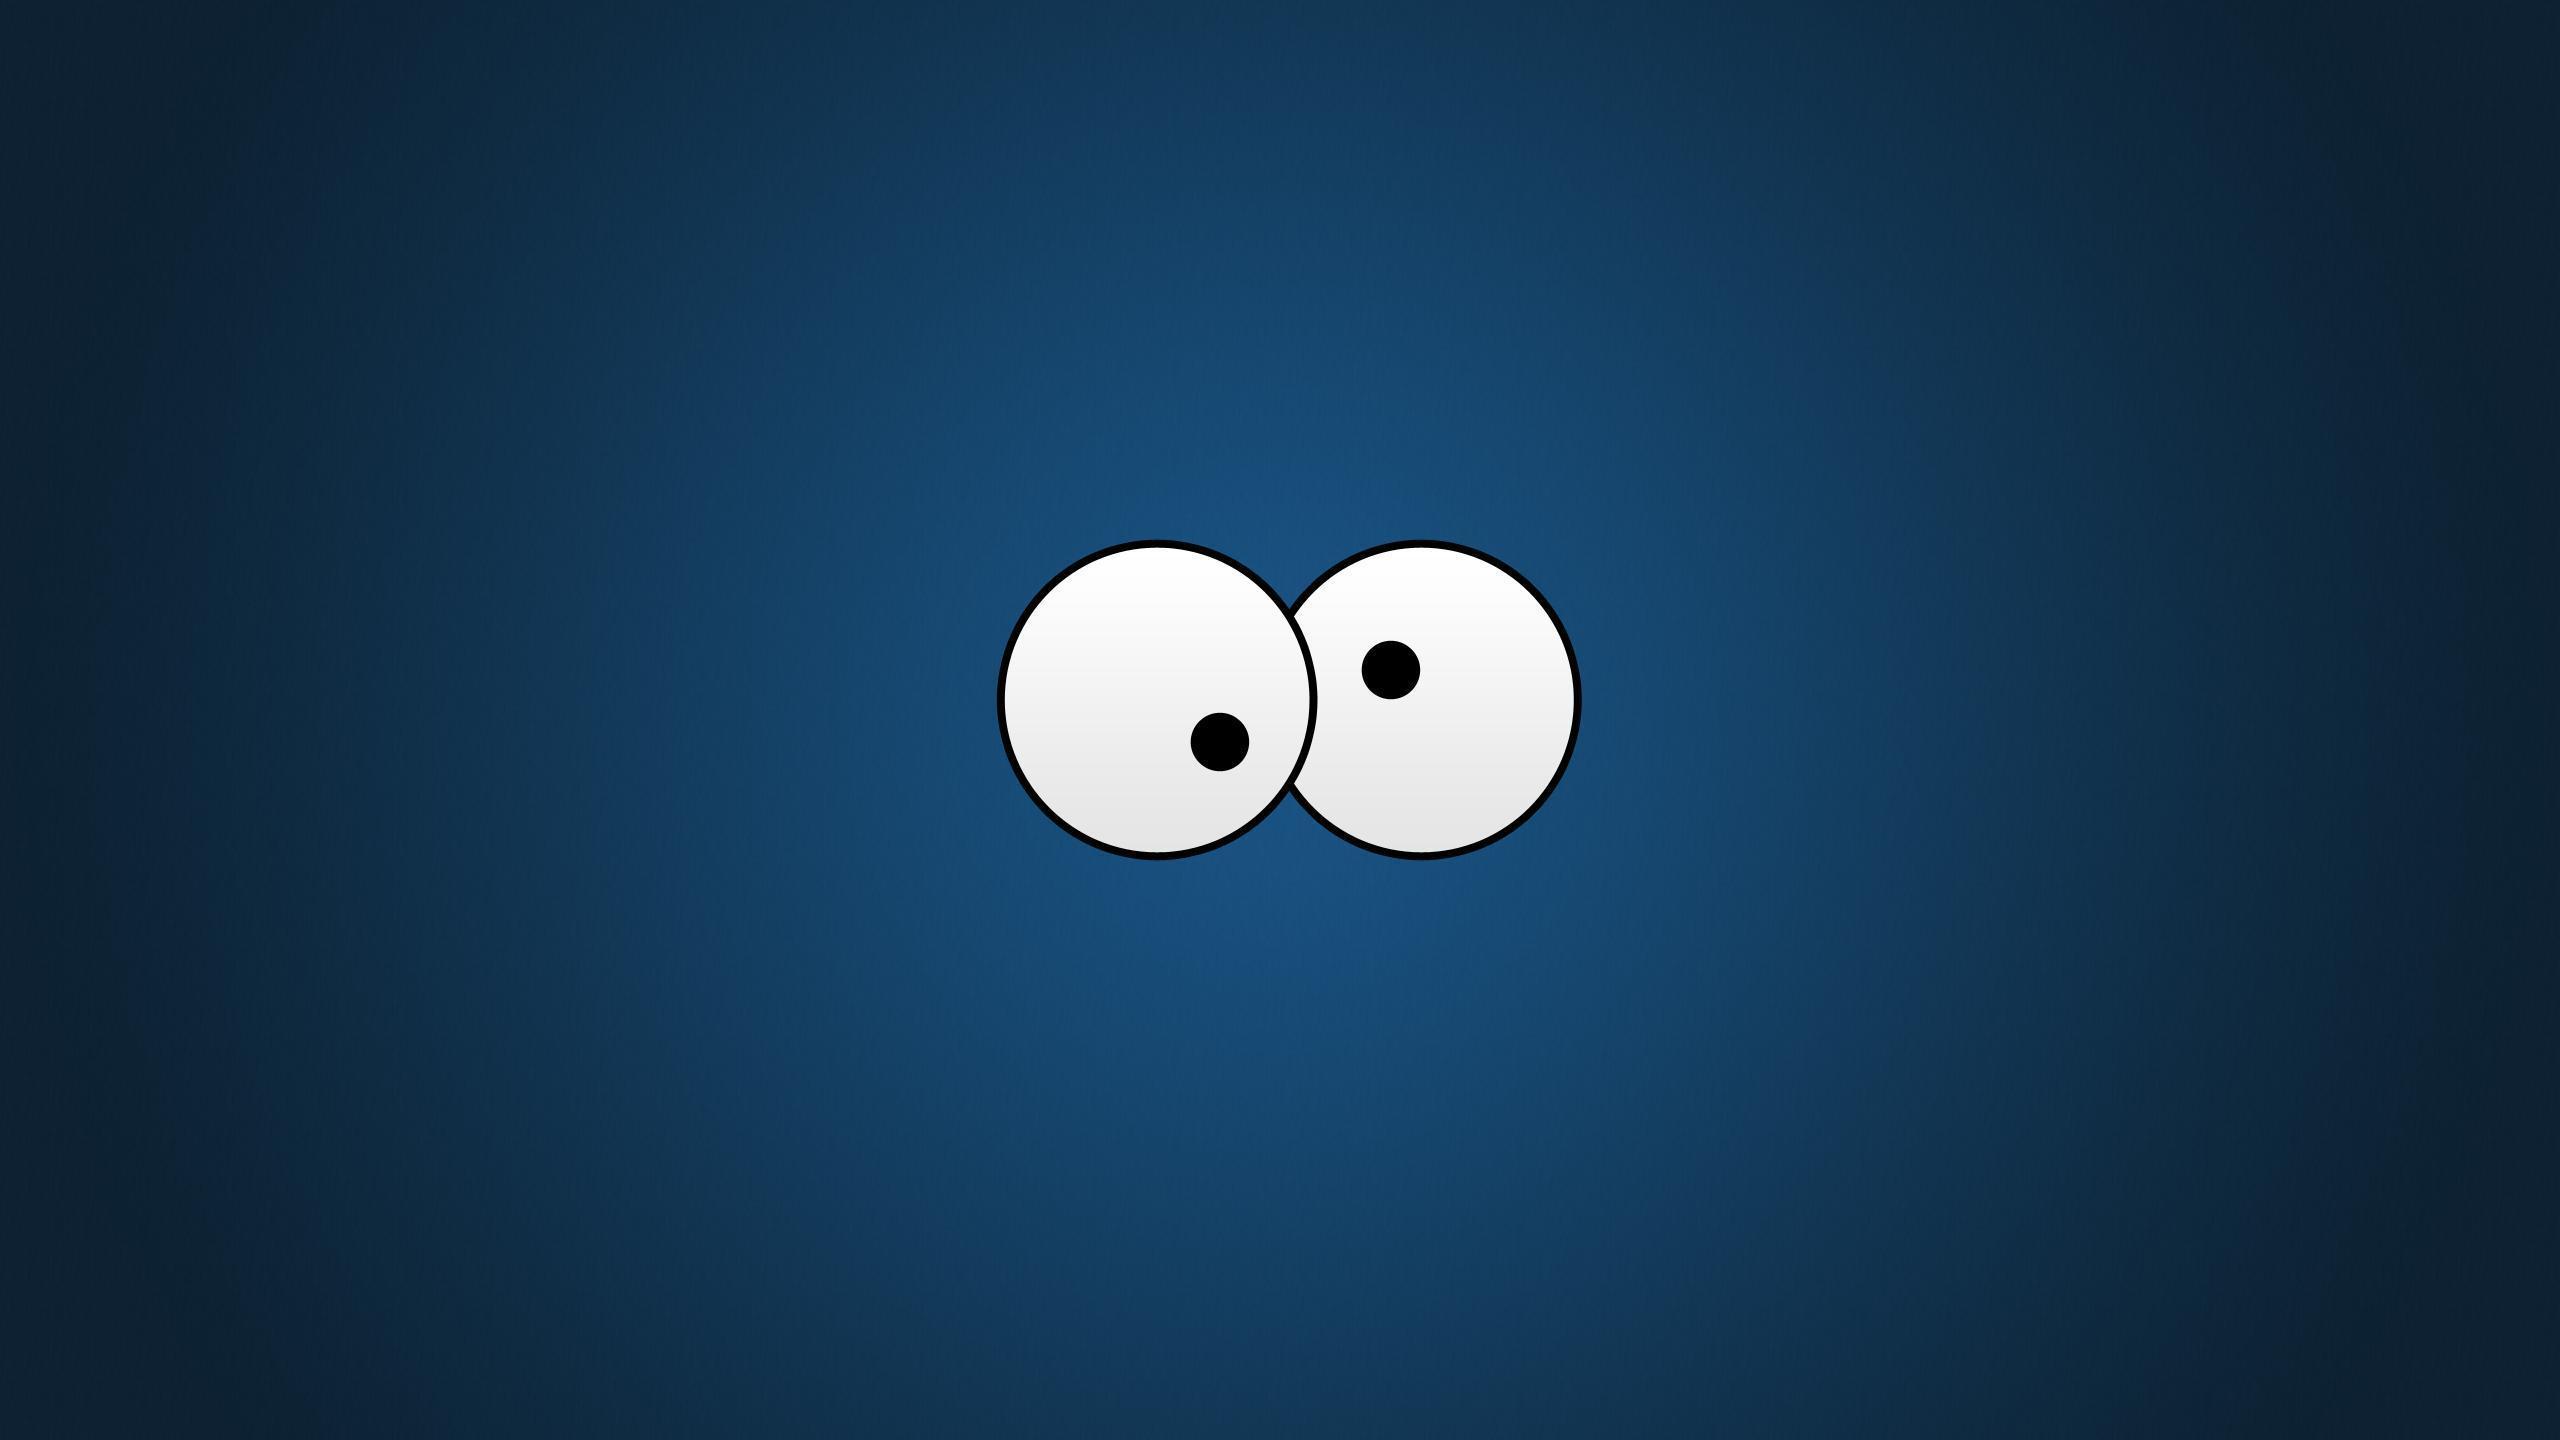 Pacman Wallpaper Iphone X Cookie Monster Backgrounds Wallpaper Cave